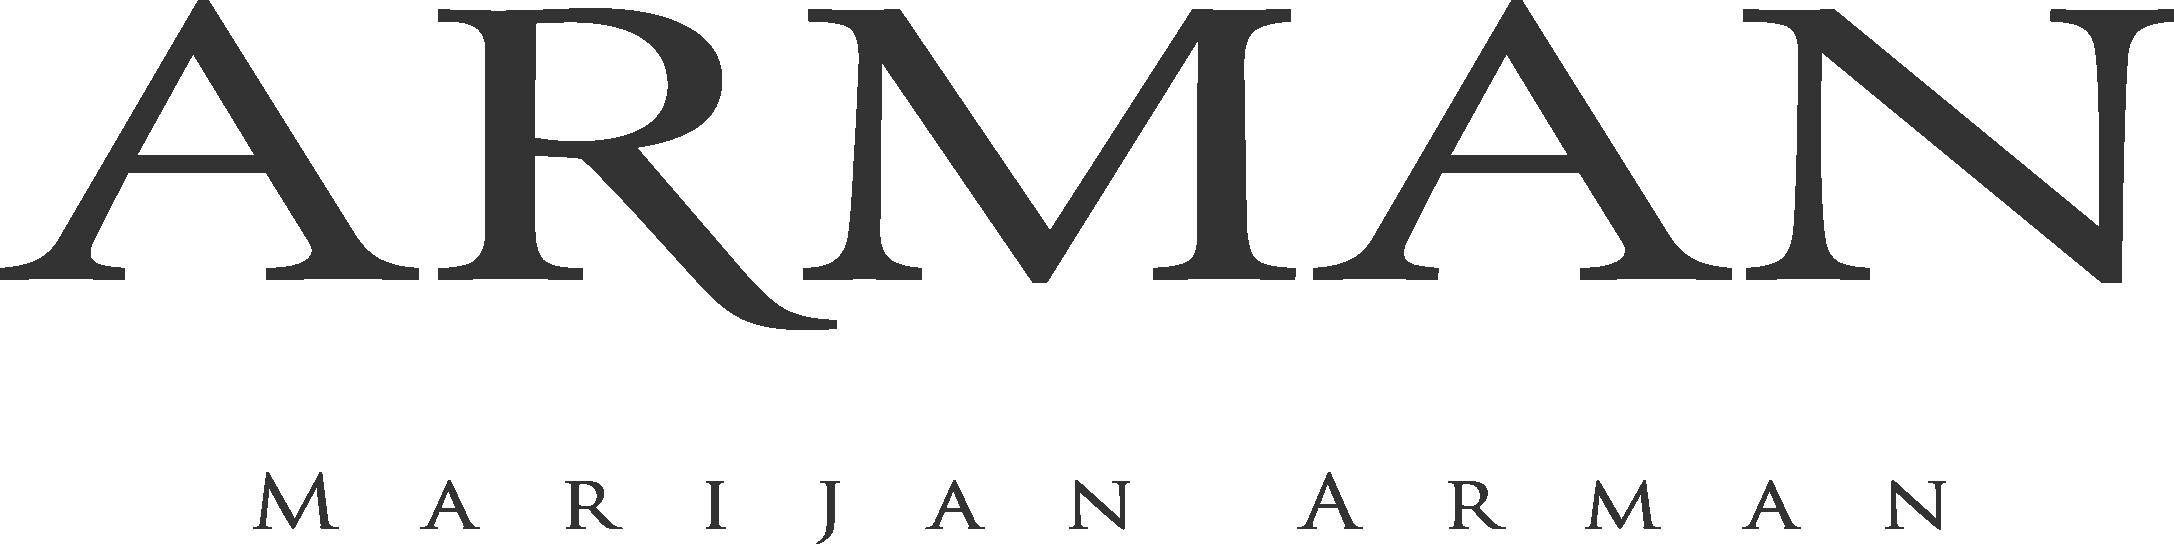 ARMAN MARIJAN_Logotype_BIJELI.png